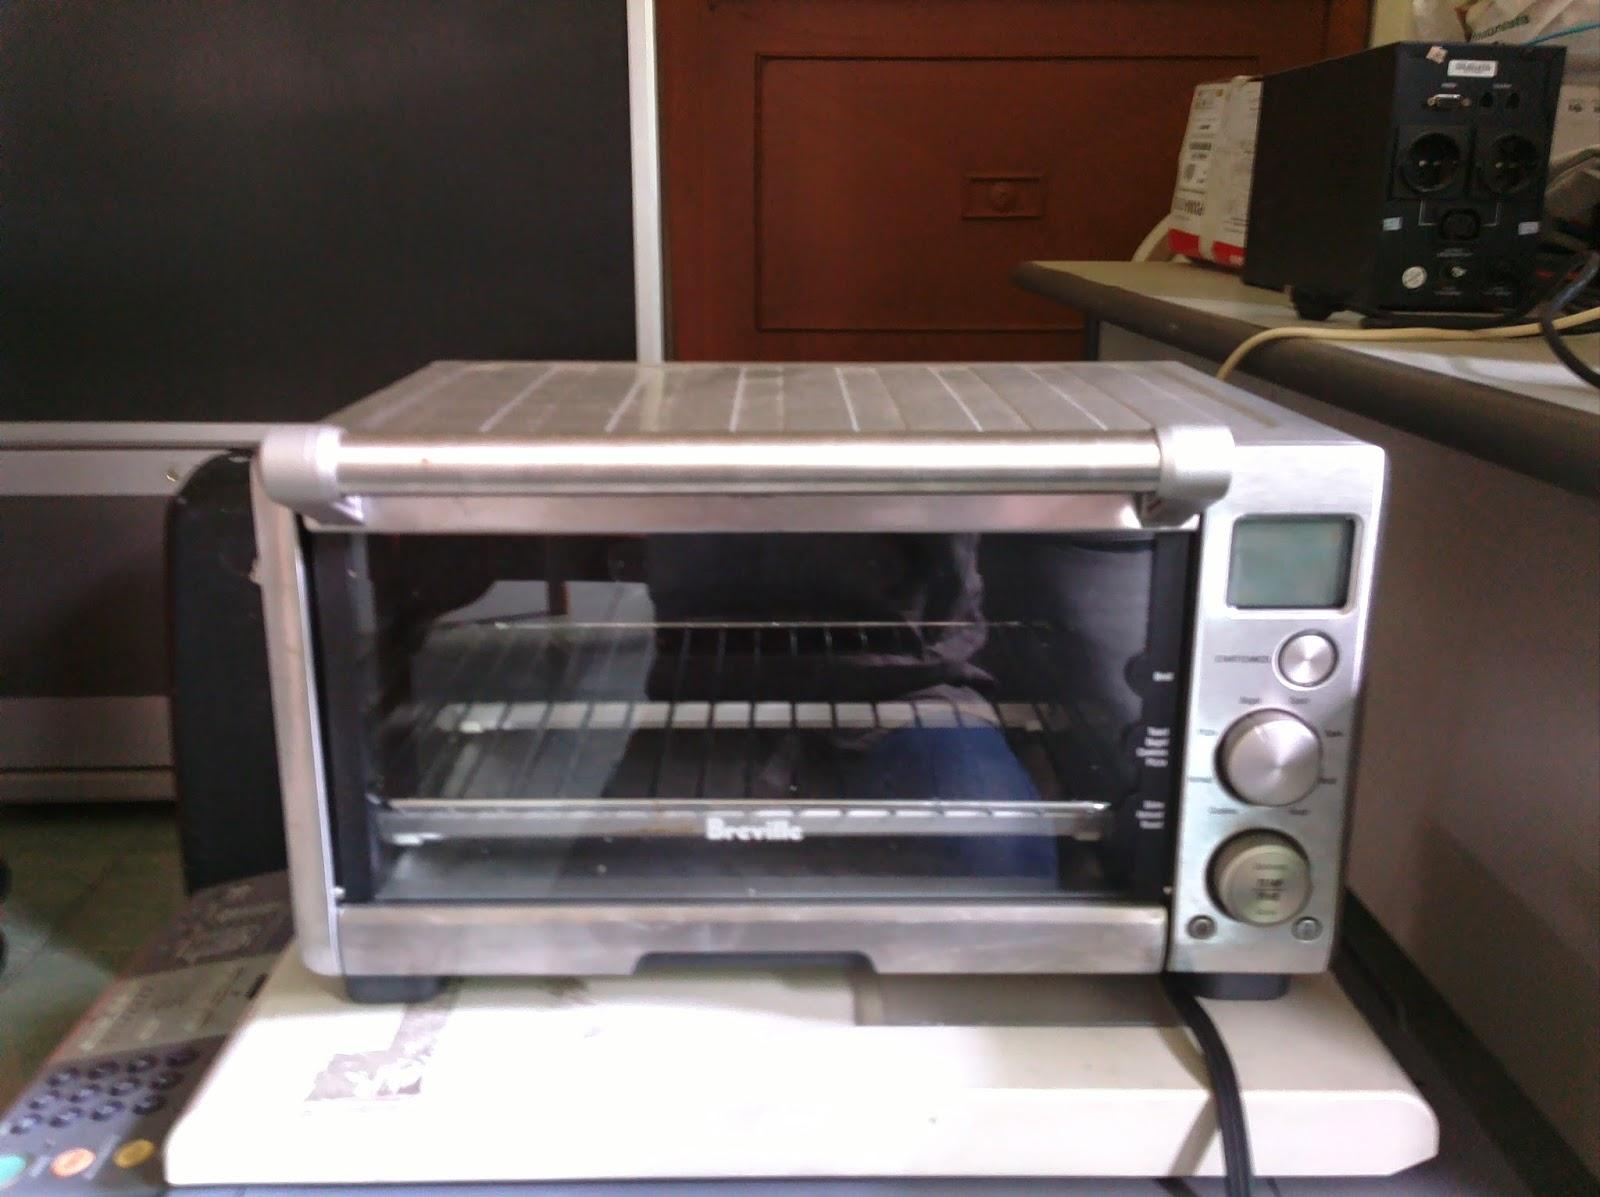 breville microwave barang bekas murah